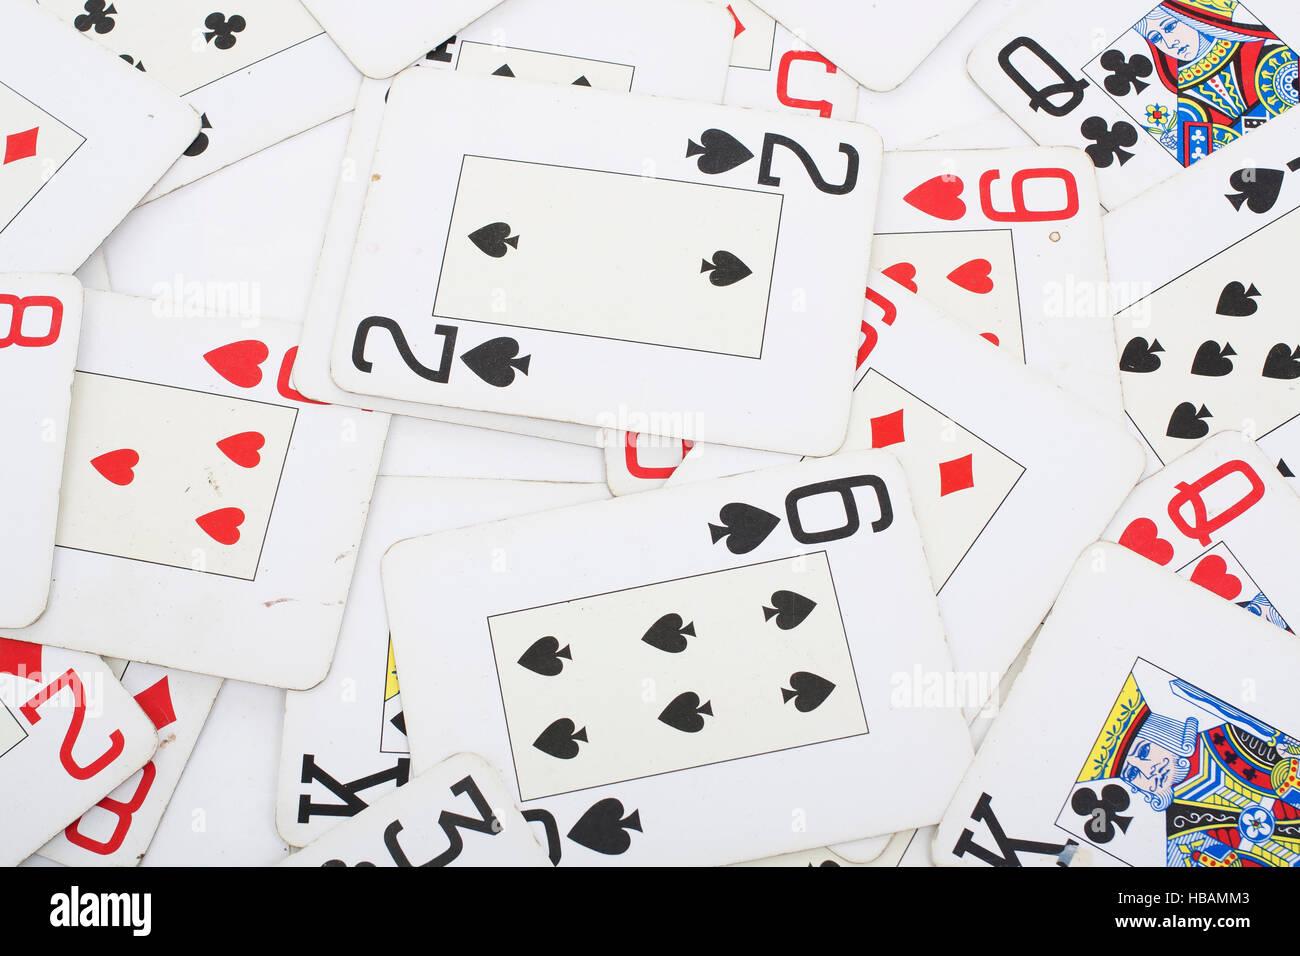 Poker jogo de sorte how to get help for gambling problem